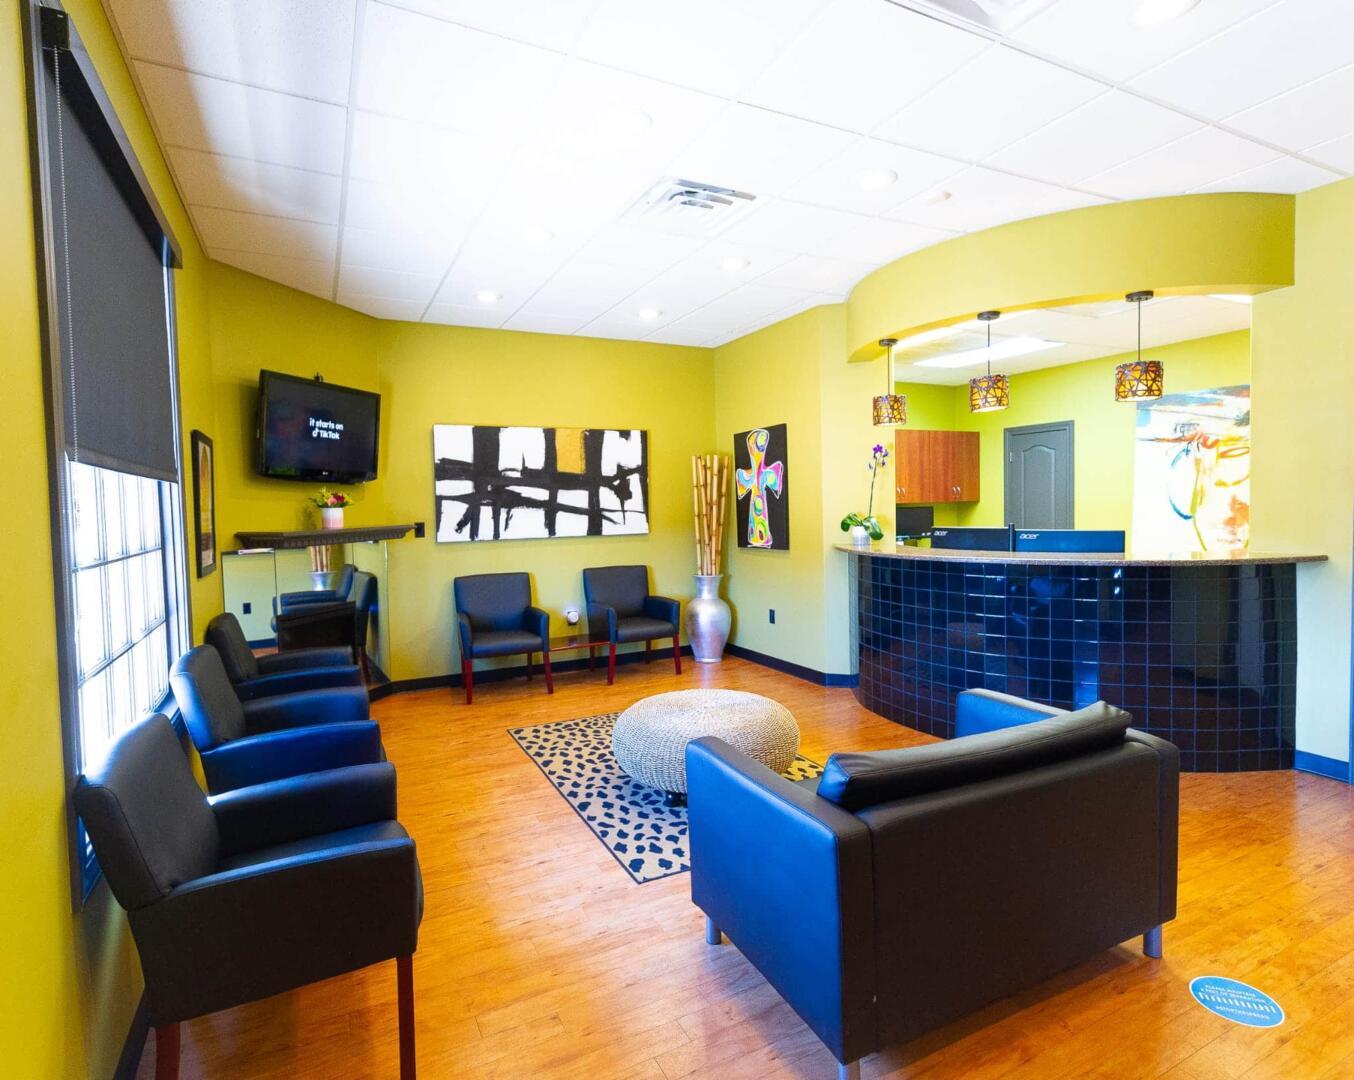 Office Interior Gairhan Dental Care 2020 Jonesboro AR Dentist 2 - Home